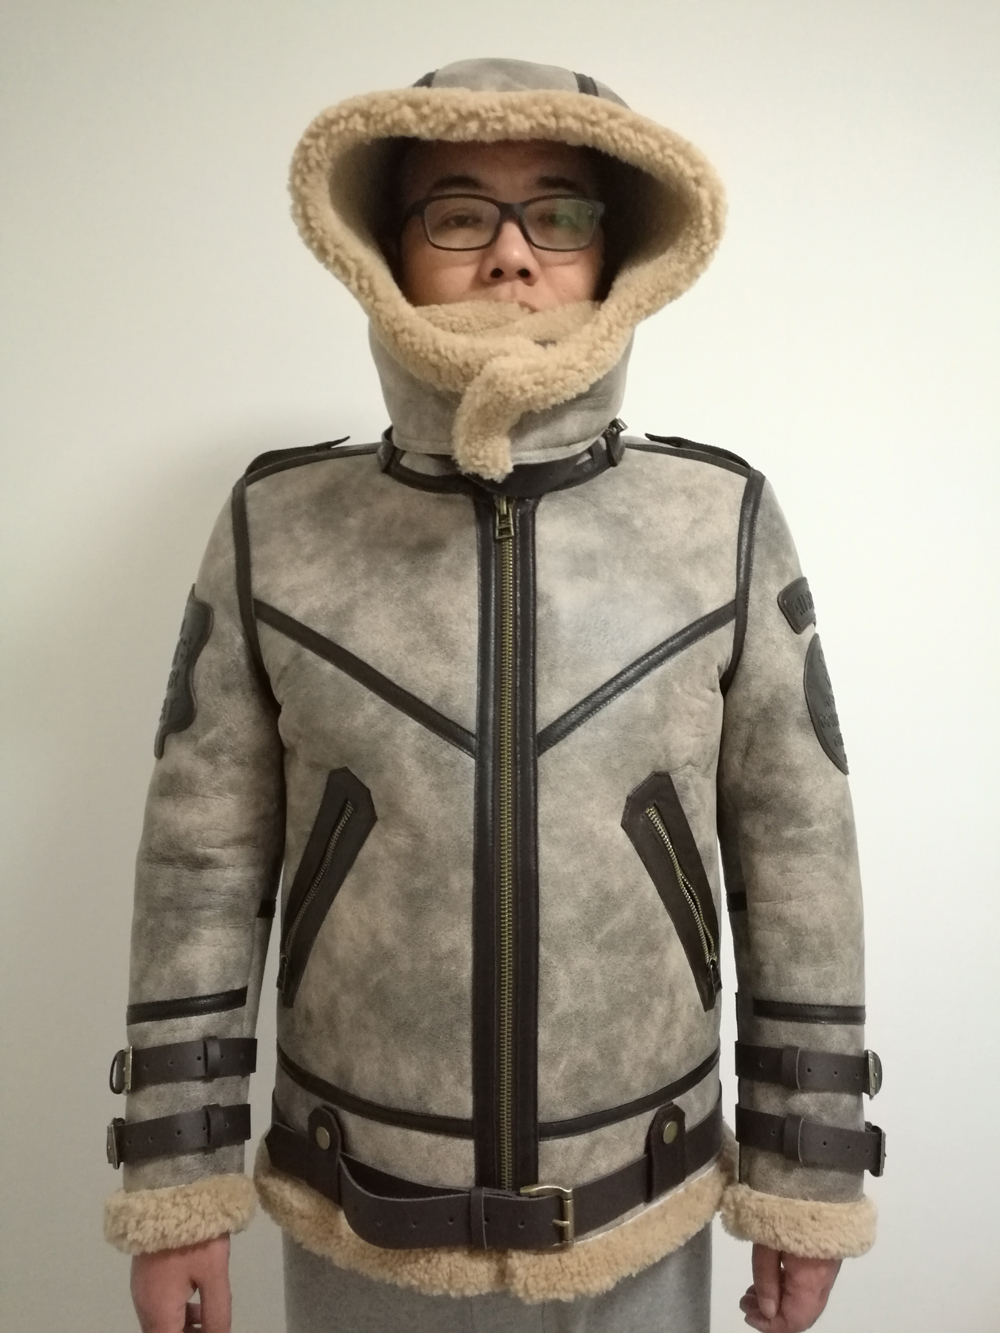 H55c733a8c14b455e8355e557c85f46819 2019 Fashion 100% Quality Real Sheepskin Fur Men Coat Genuine Full Pelt Sheep Shearling Male Winter Jacket Brown Men Fur Outwear